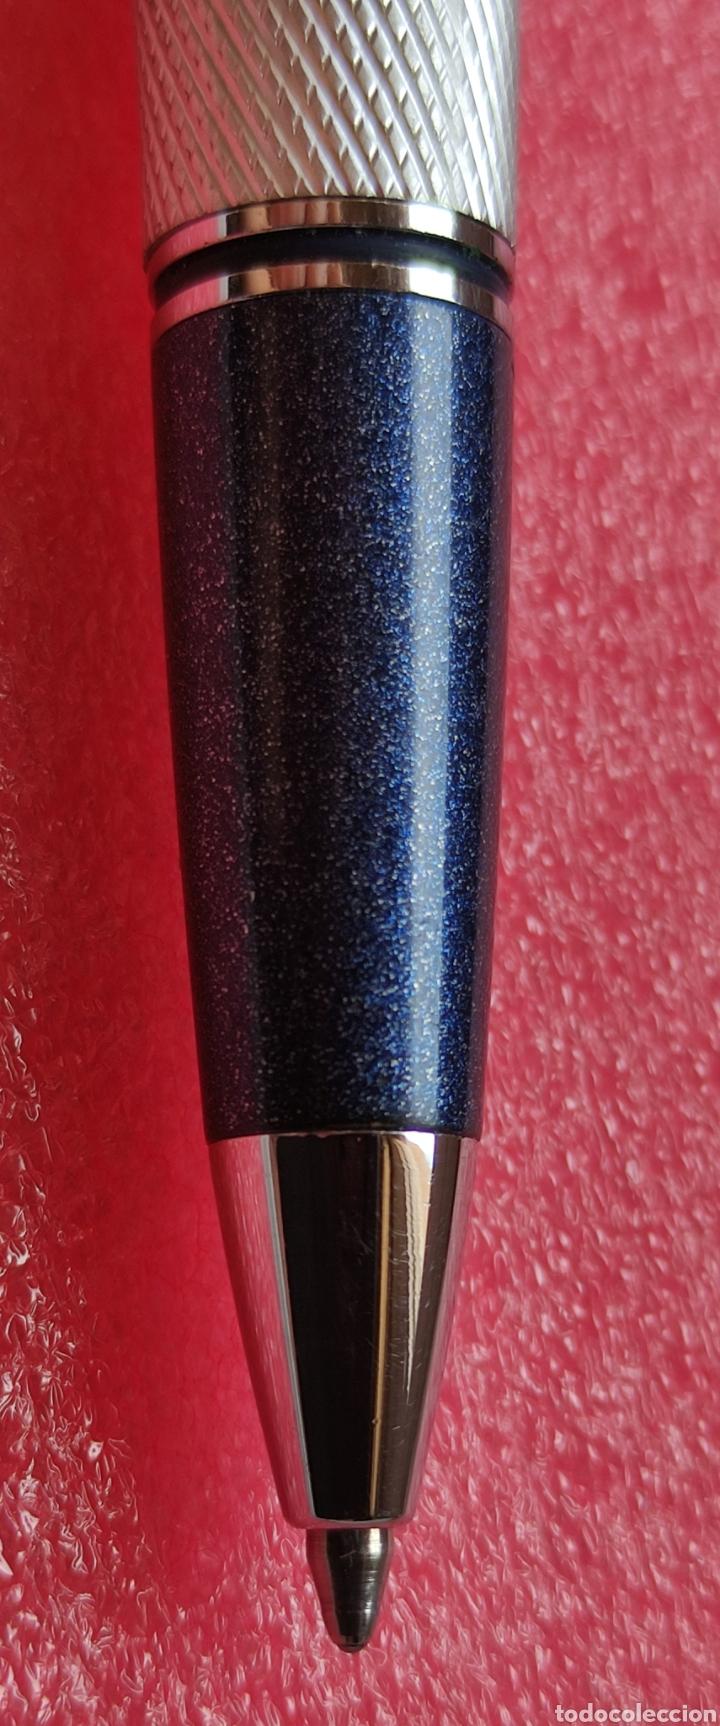 Bolígrafos antiguos: Bolígrafo SERGIO TACCHINI - Foto 2 - 261844705